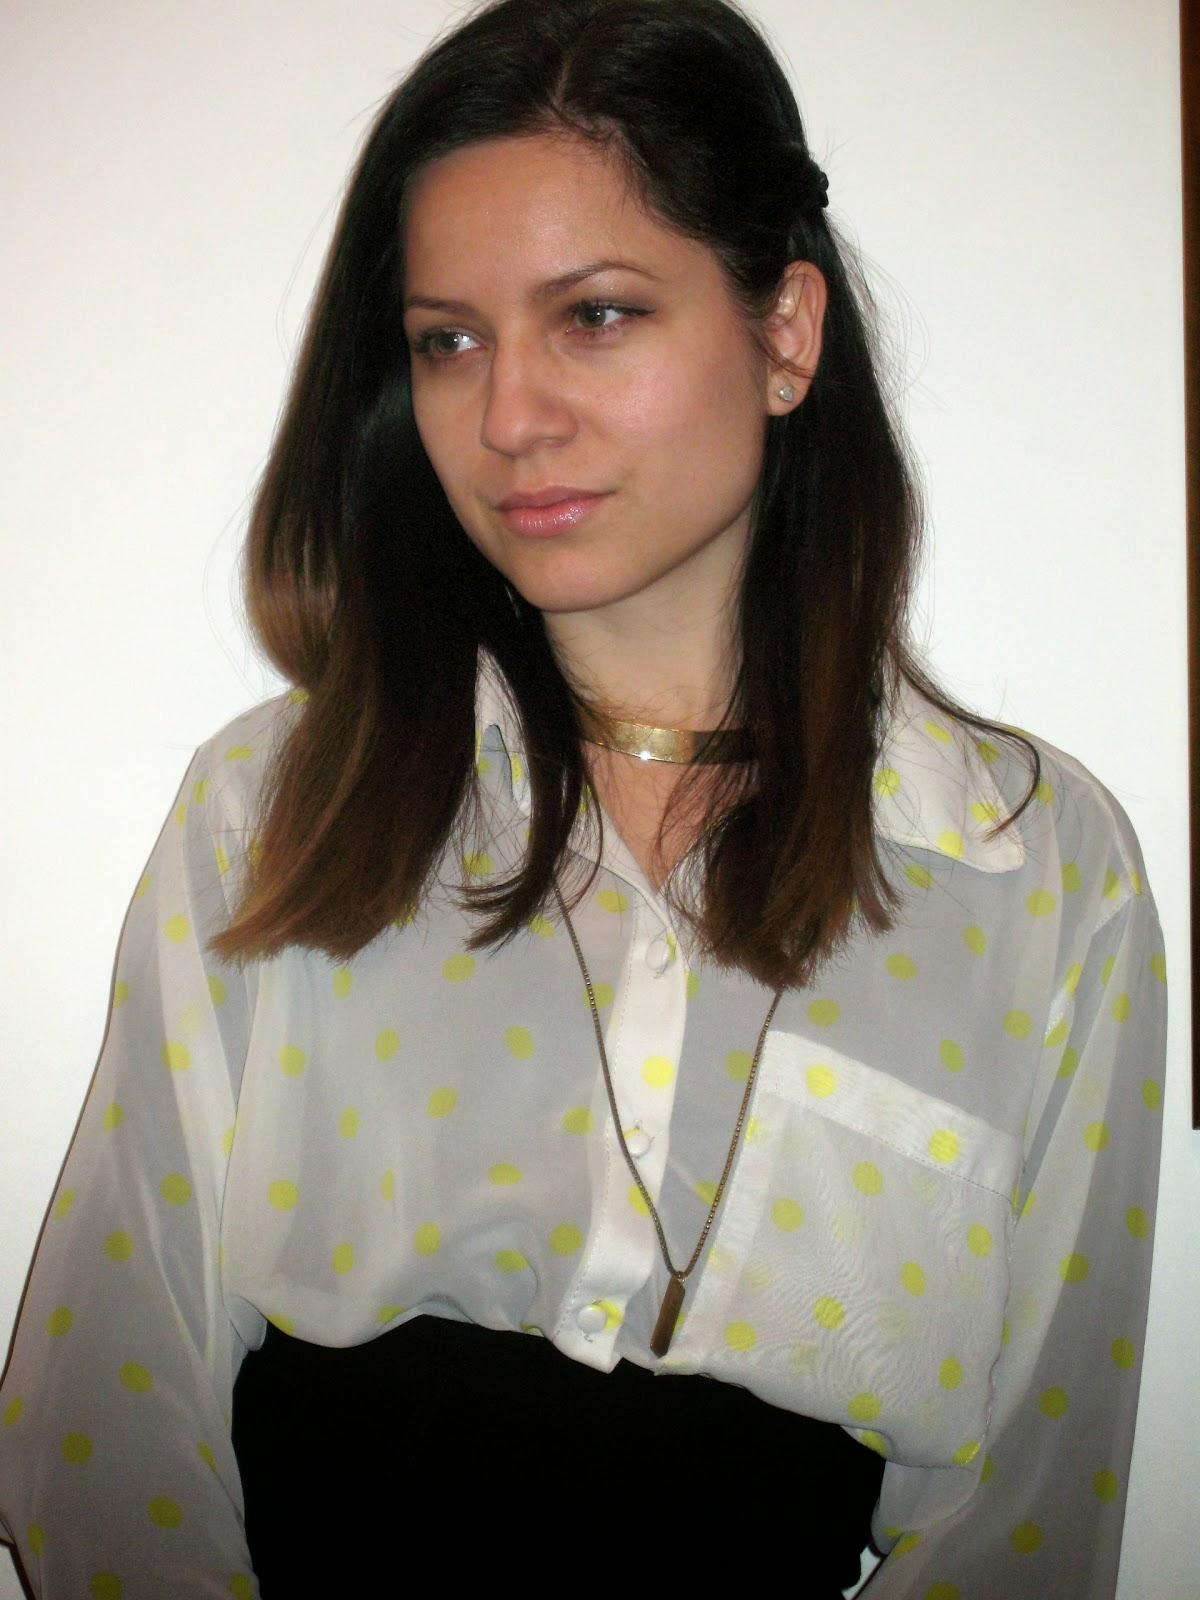 party look, black pencil skirt, sheer polka dots shirt, golden necklace, new yorker shirt,